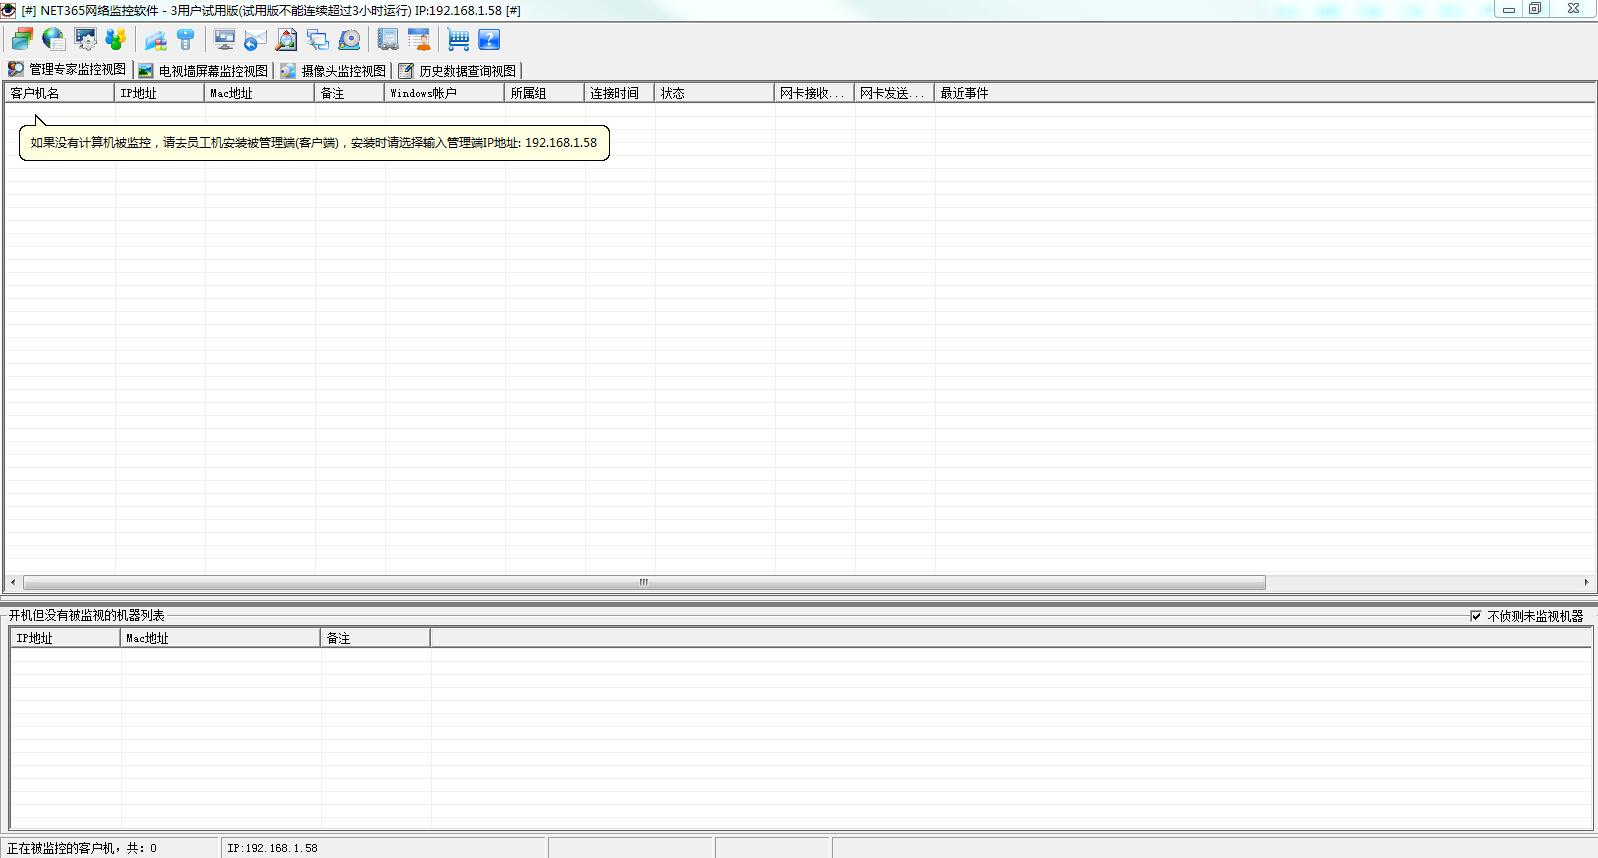 NET365网络监控软件截图1